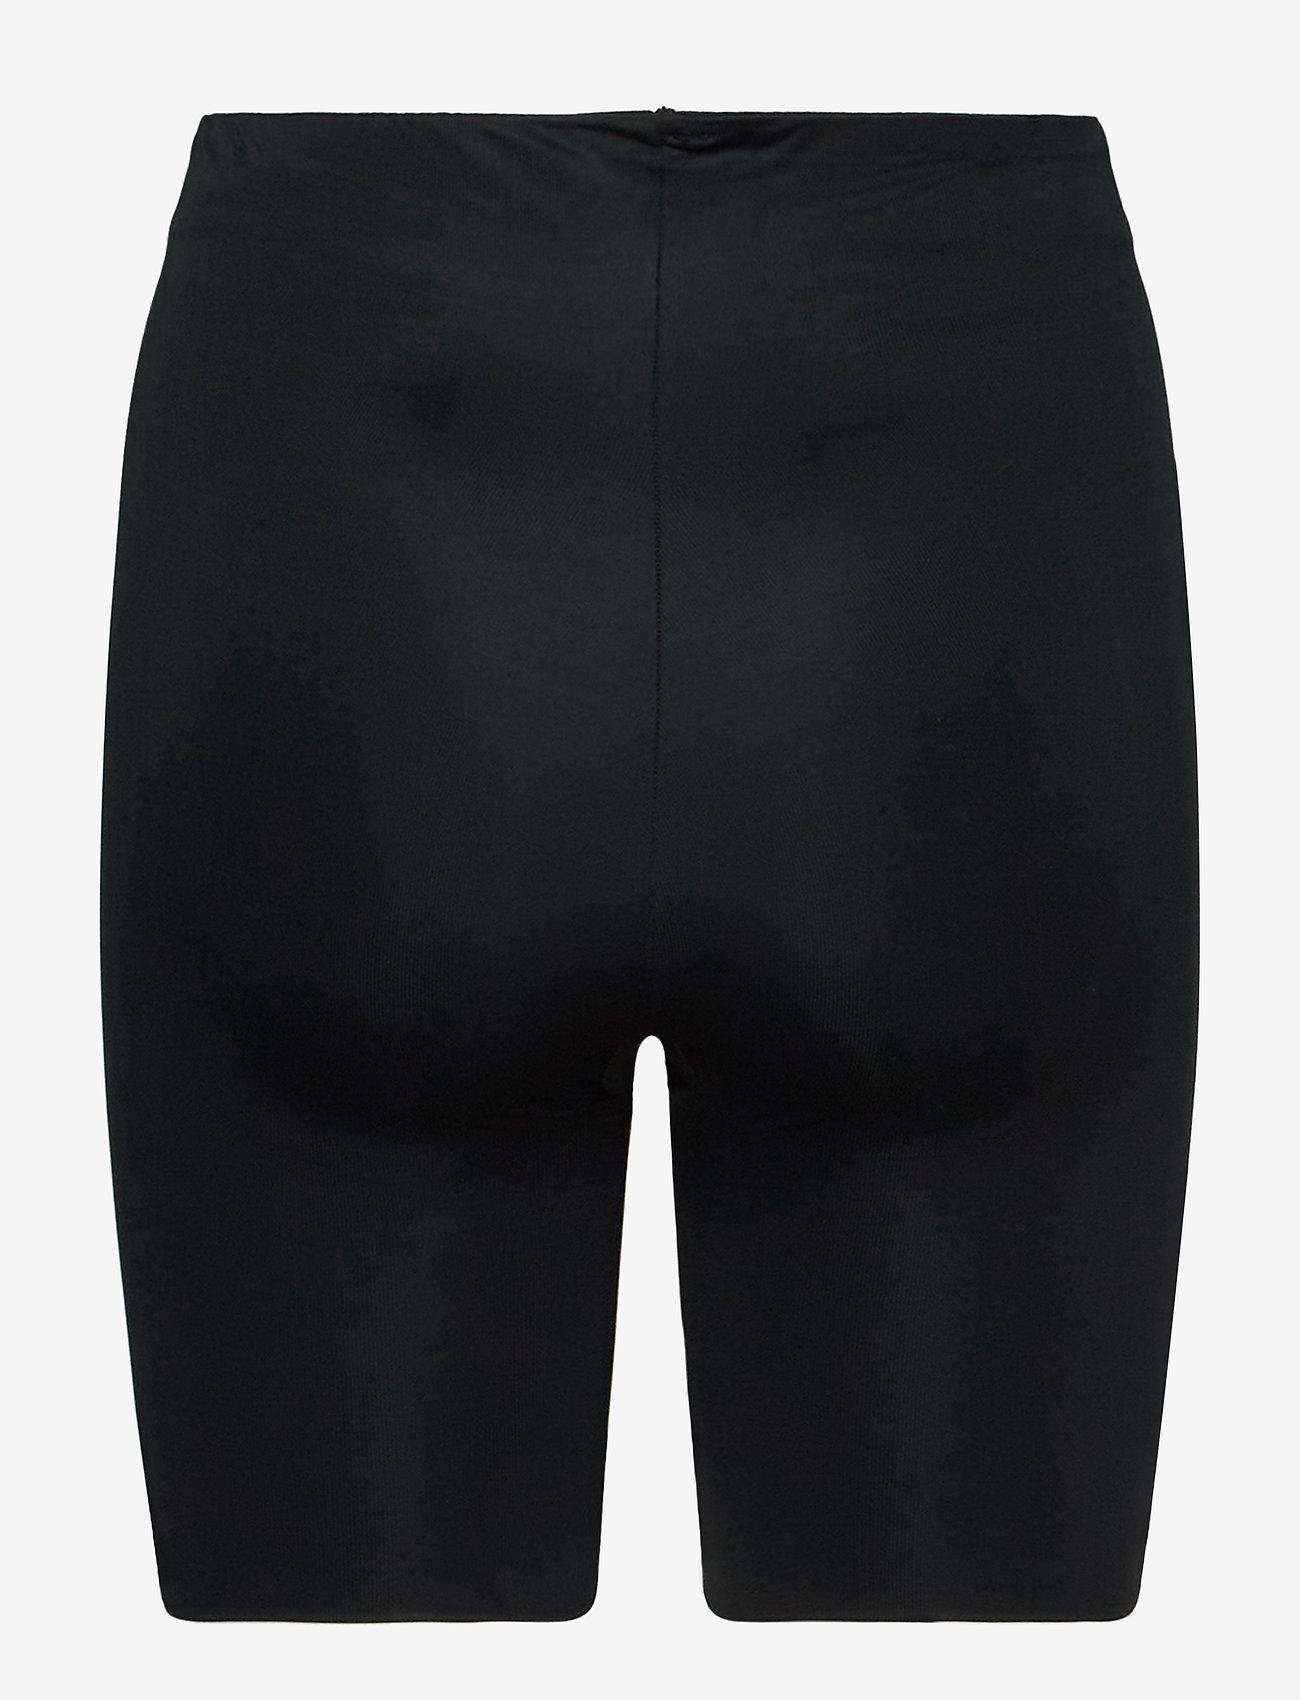 Spanx - BUTT ENCHANCE - bottoms - very black - 1